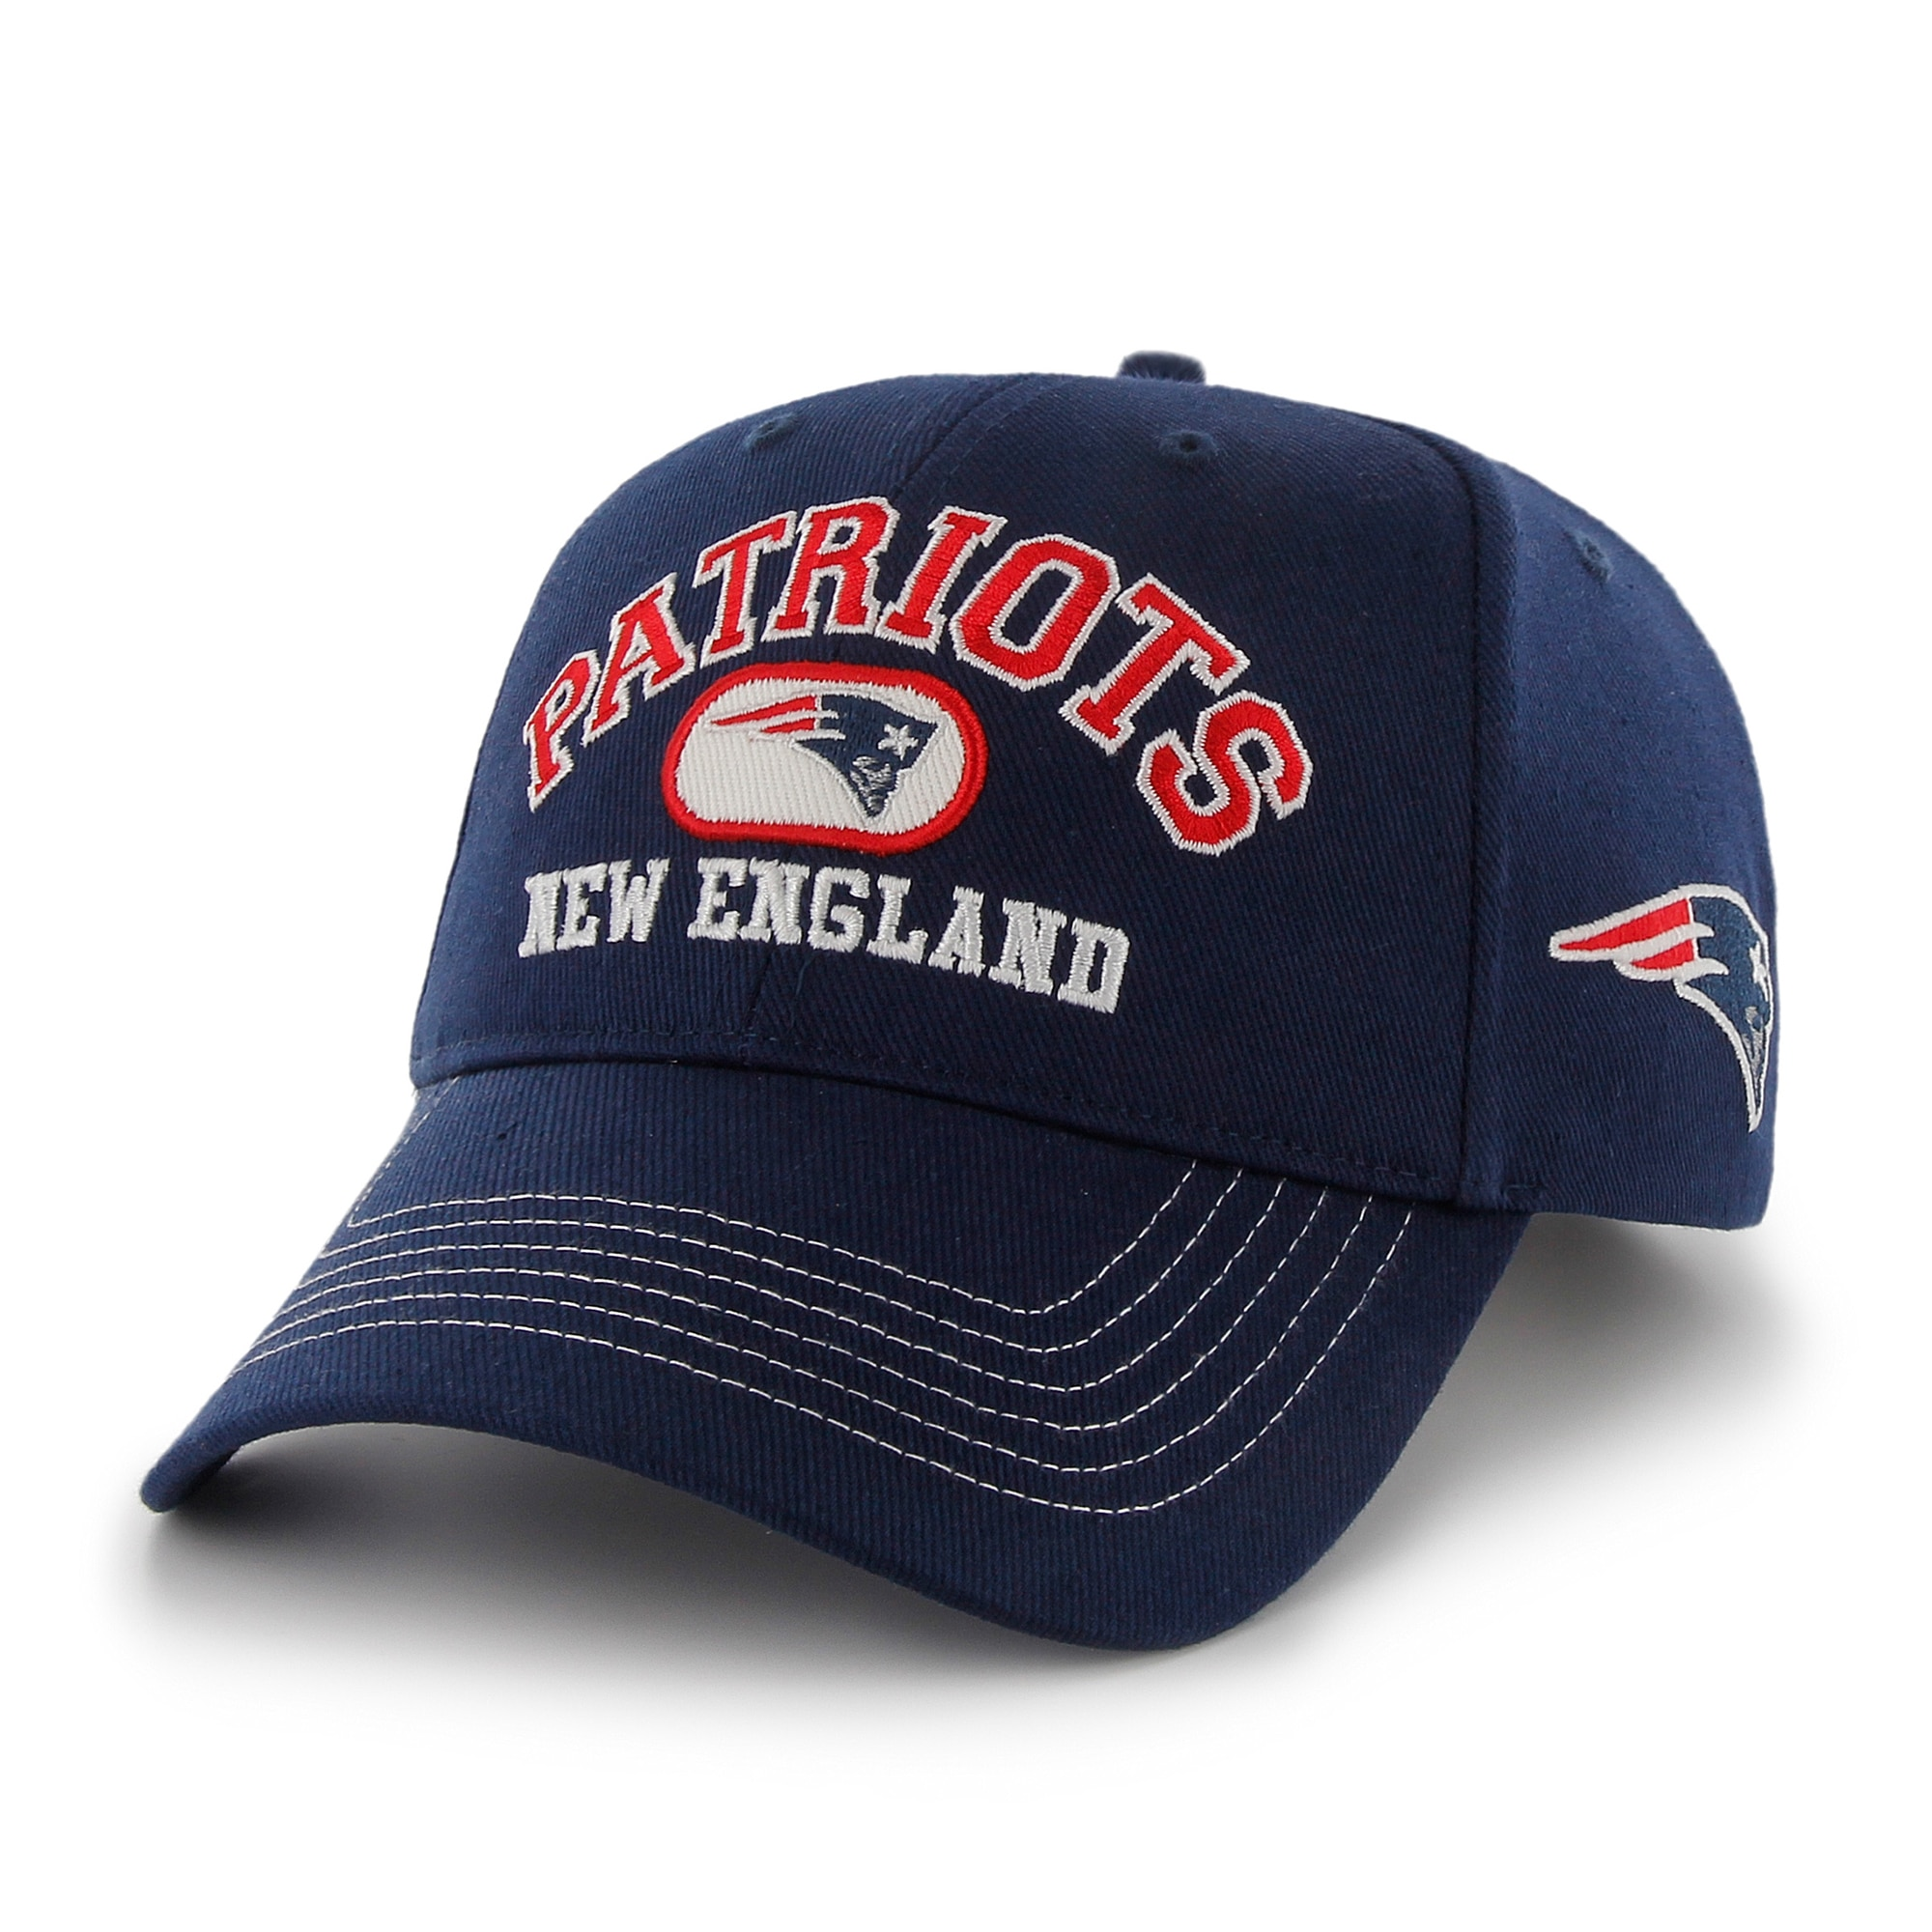 73783c1381a New England Patriots Team Shop - Walmart.com